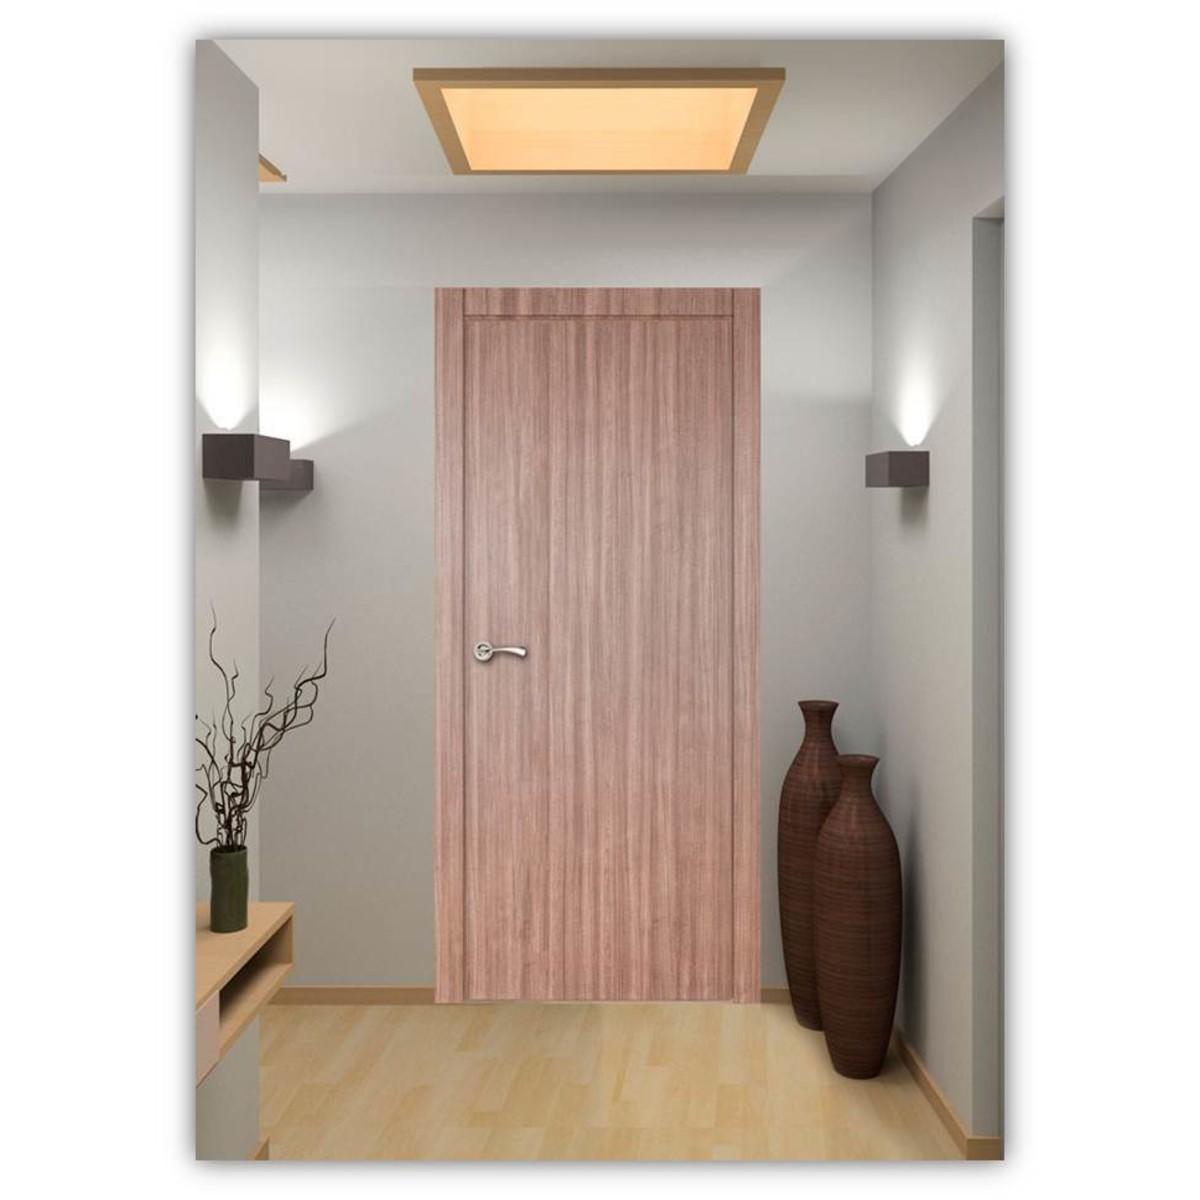 Дверь Межкомнатная Глухая Селена 70x200 Цвет Орех